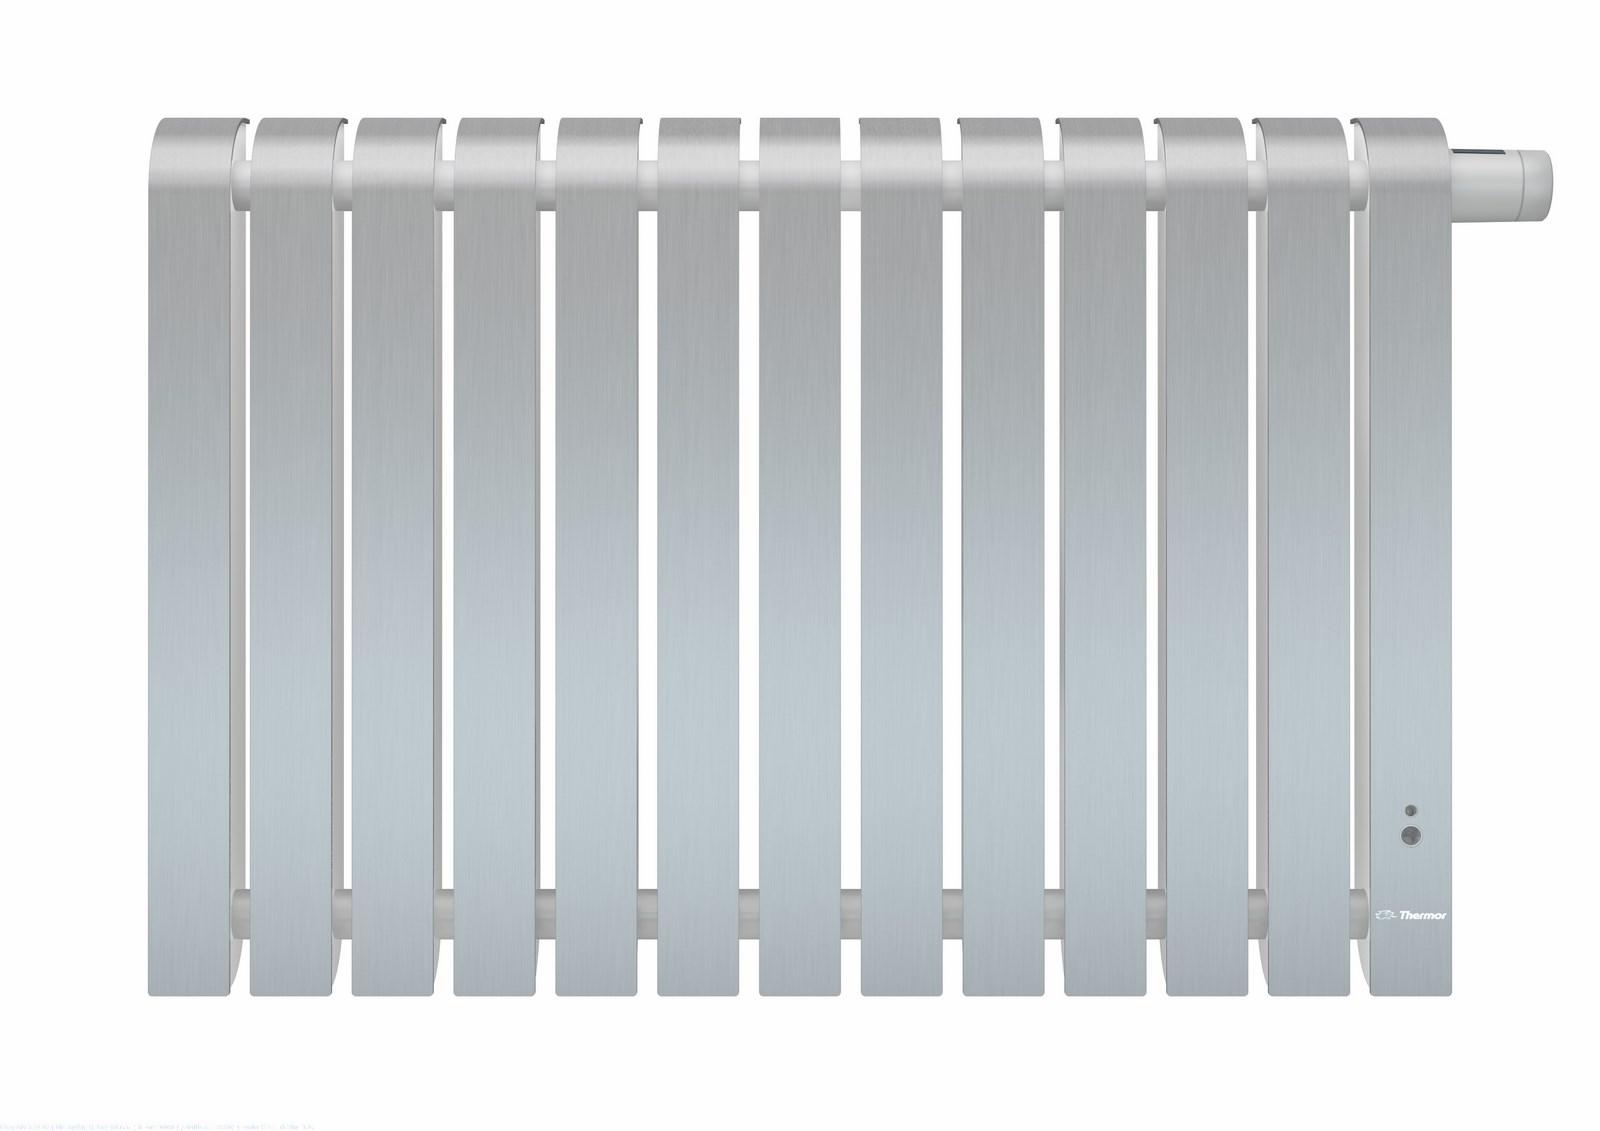 radiateur lectrique connect mythik thermor. Black Bedroom Furniture Sets. Home Design Ideas